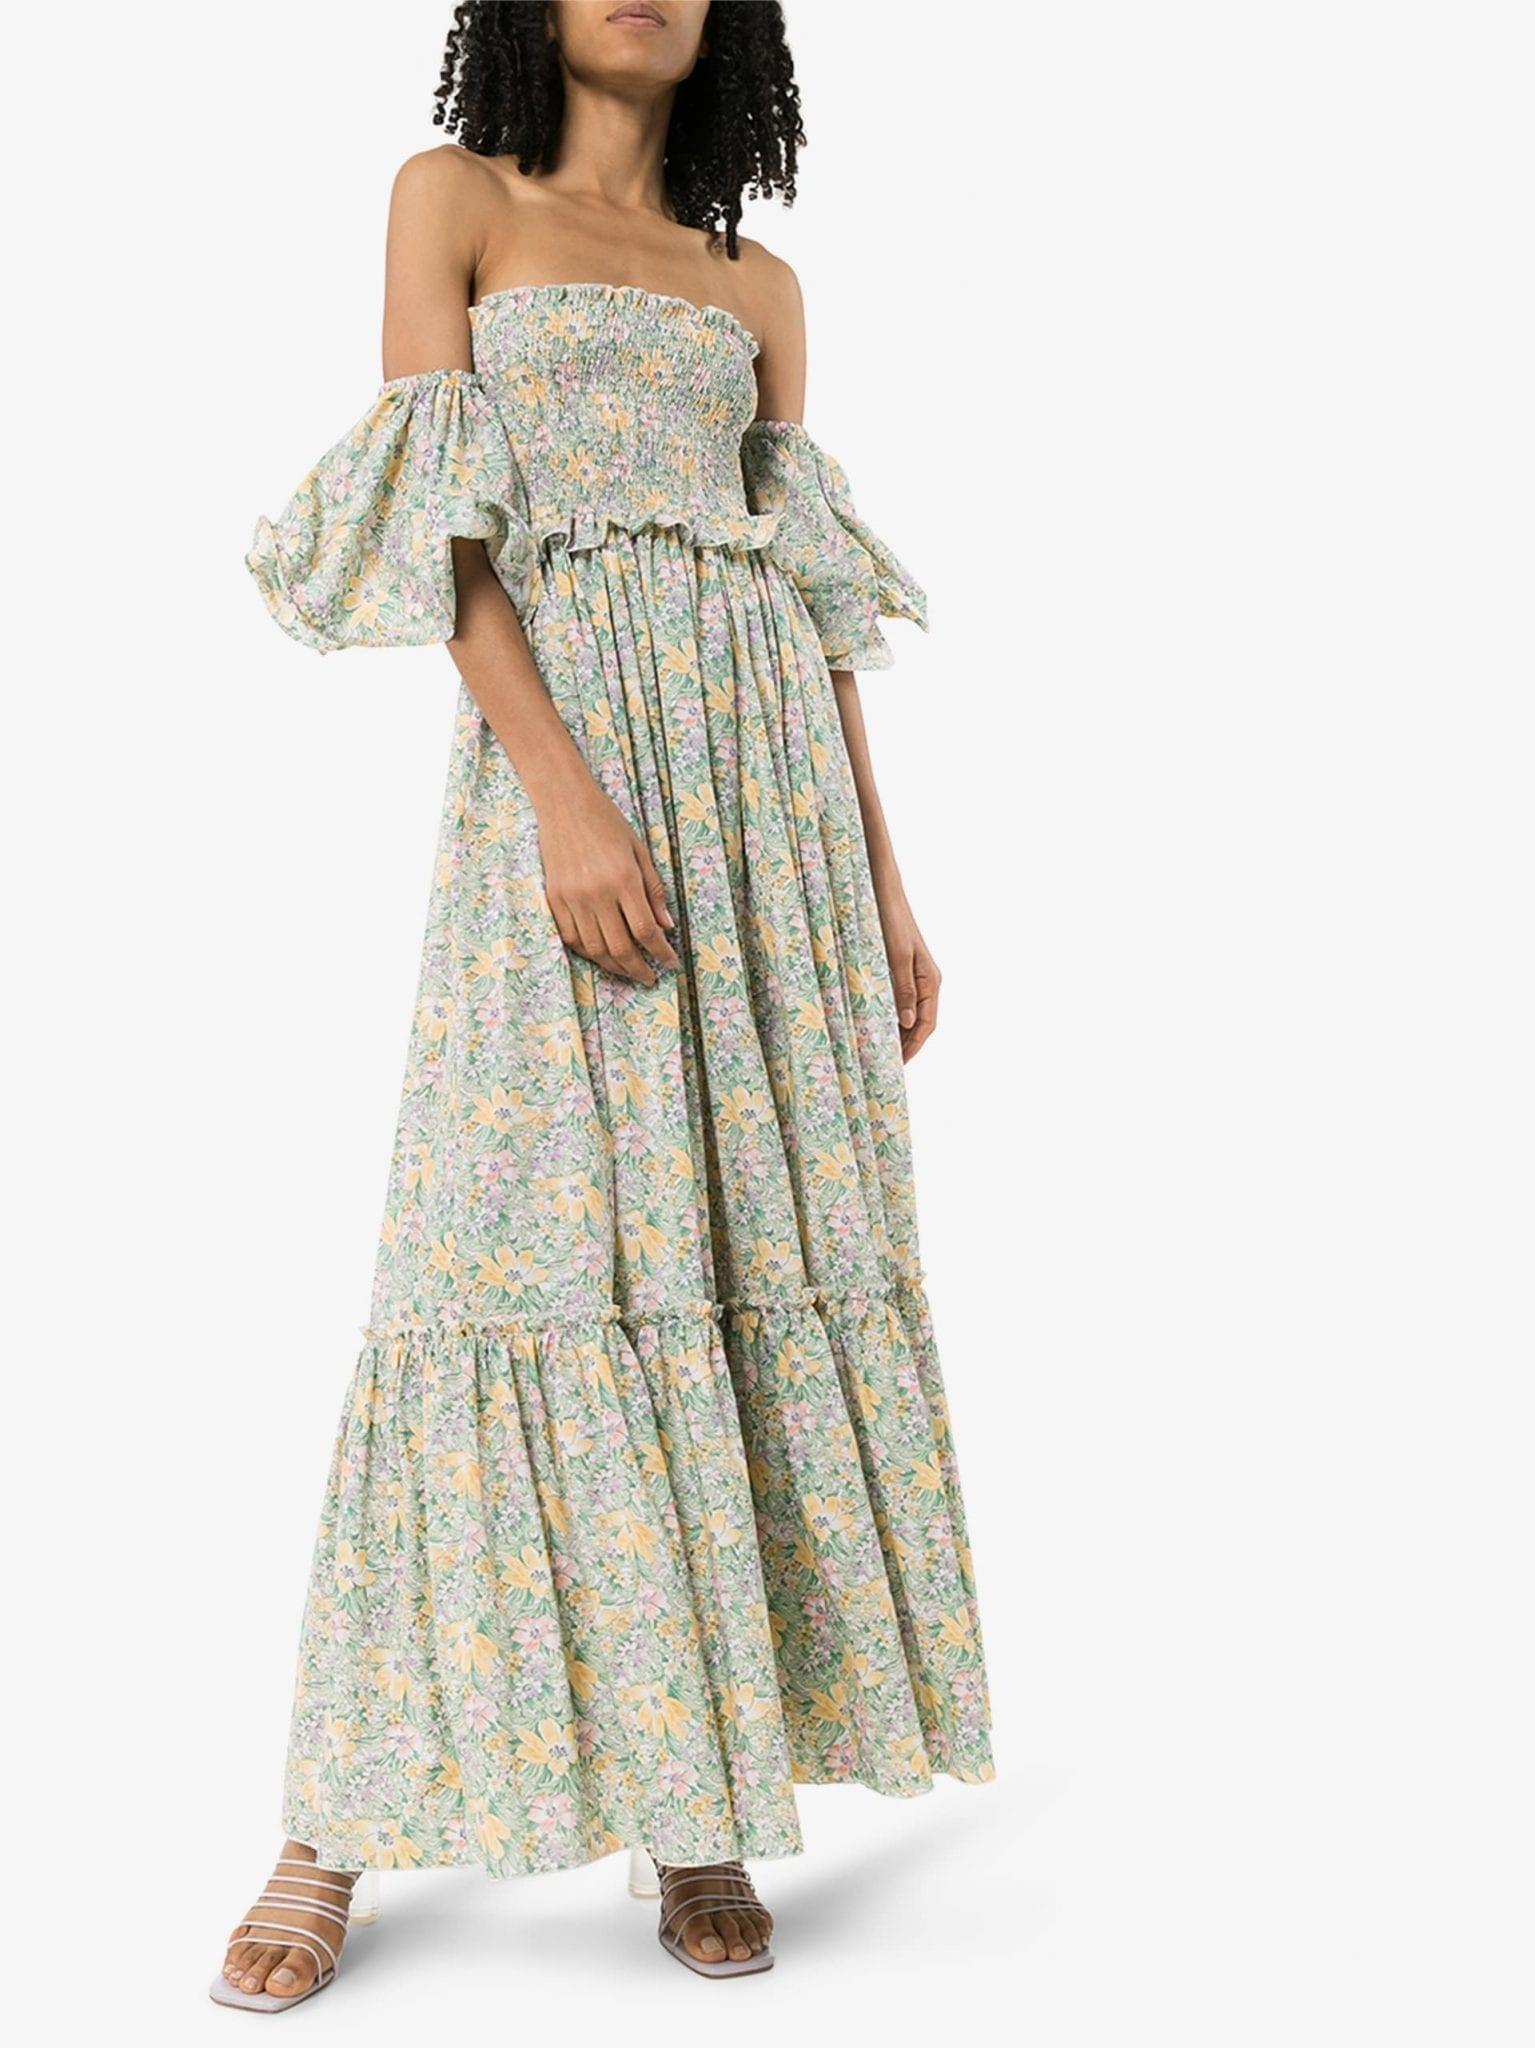 MASTERPEACE Floral Print Cotton Maxi Dress